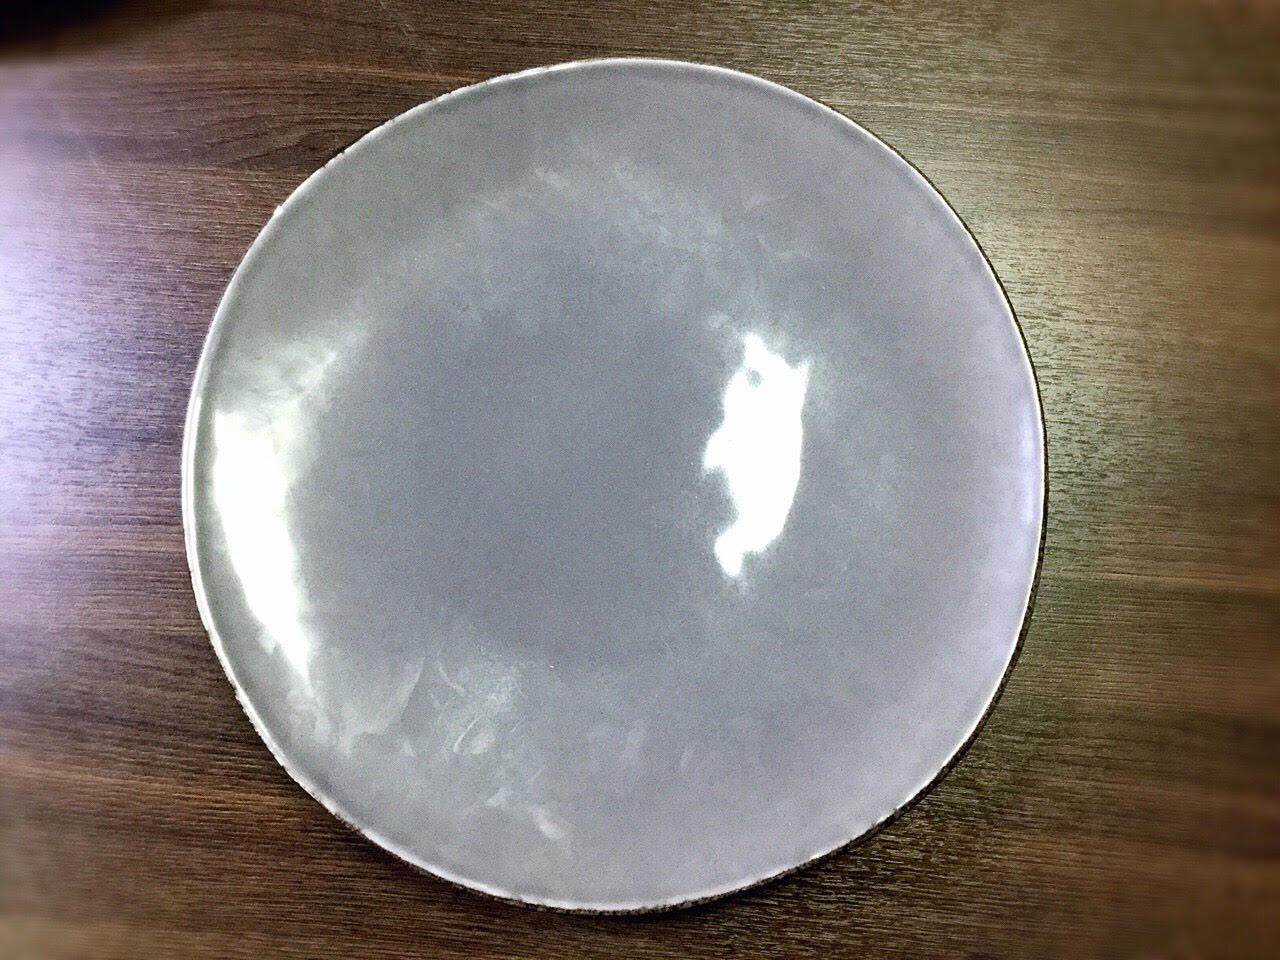 тарелка мелкая без борта 17 см